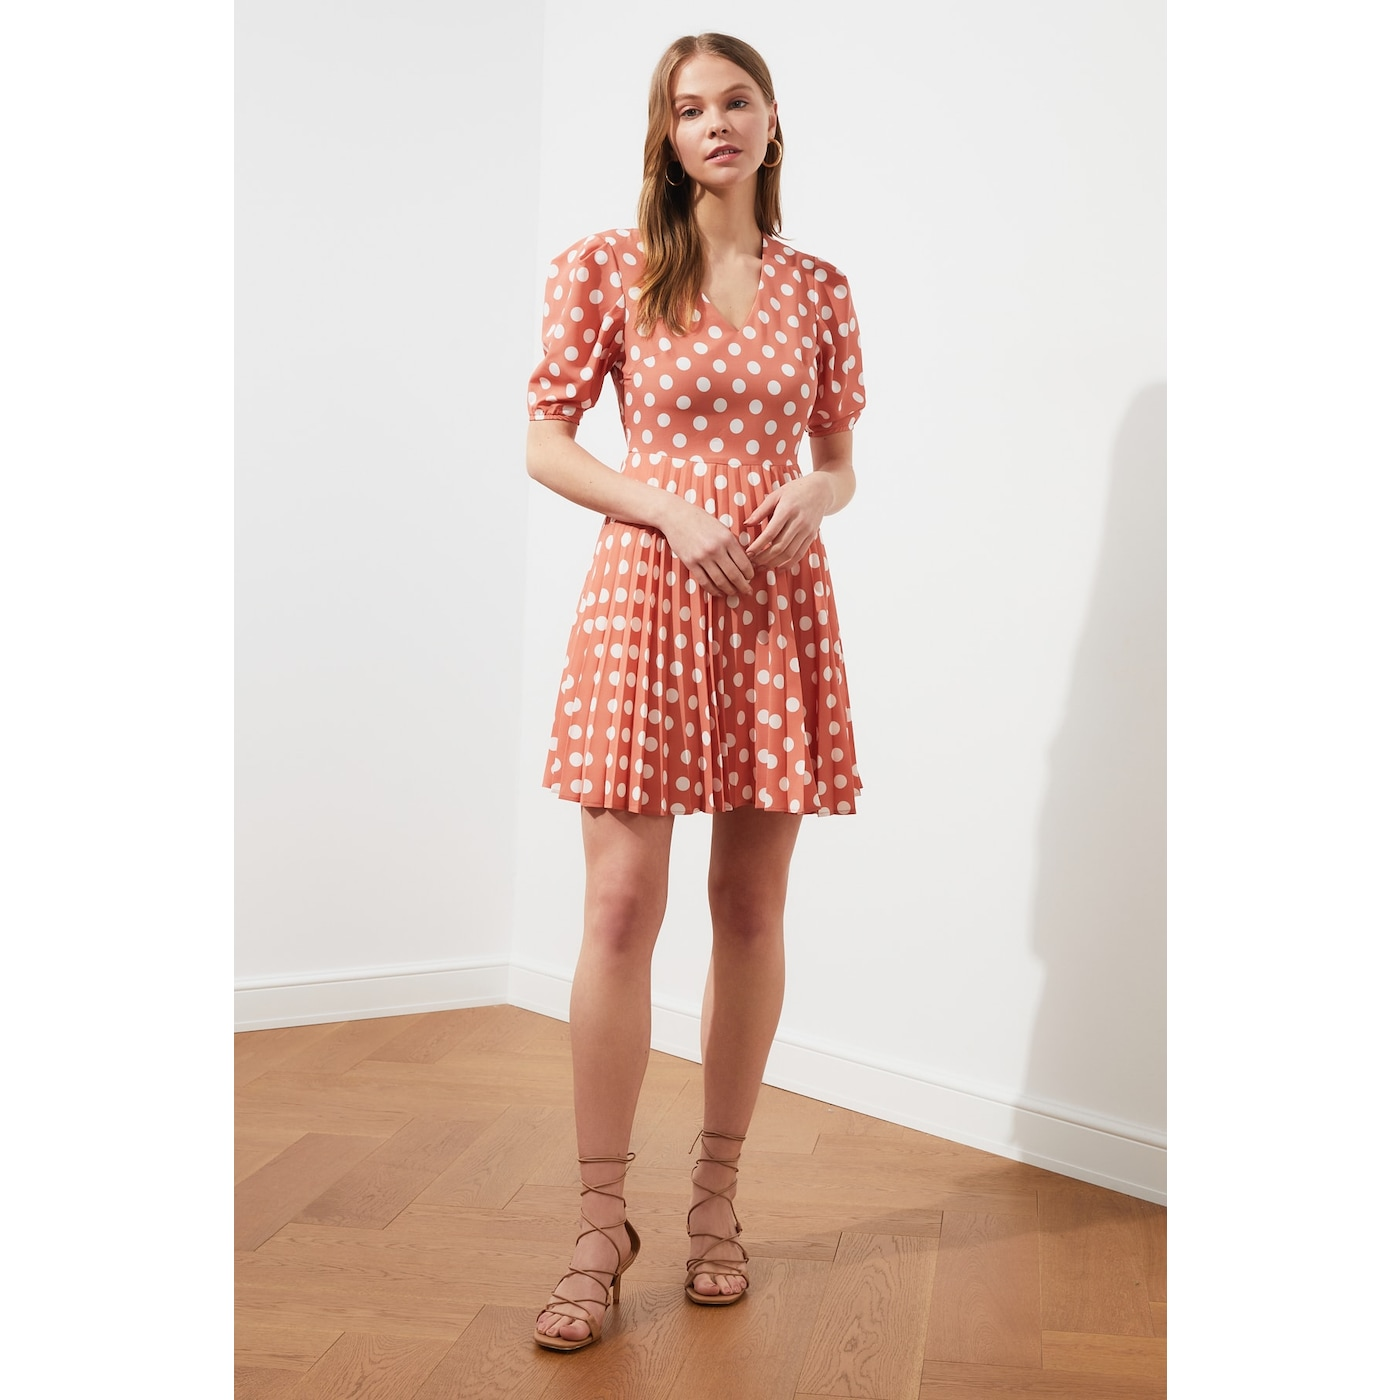 Trendyol Tile Polkalic Pleat Dress dámské 40